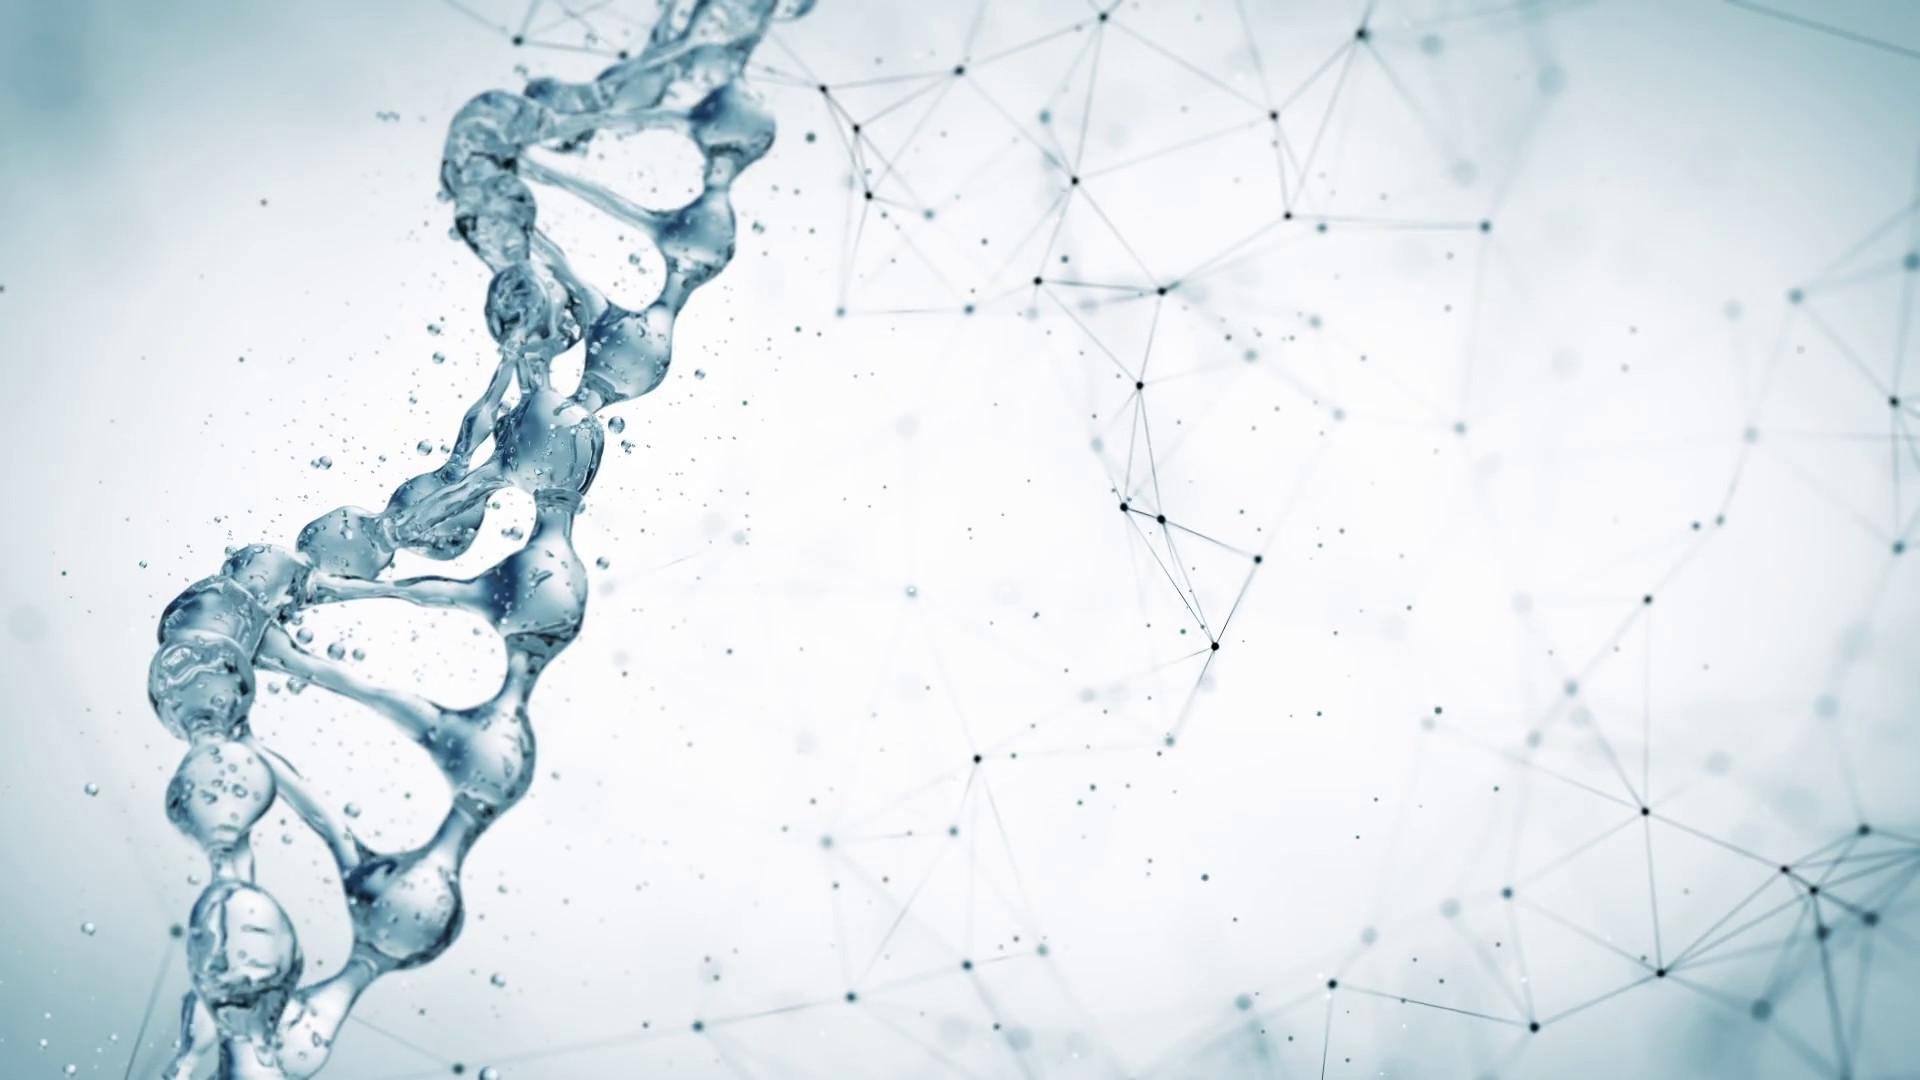 The Joker Animated Wallpaper Background Nanotechnology Hd 183 ① Wallpapertag